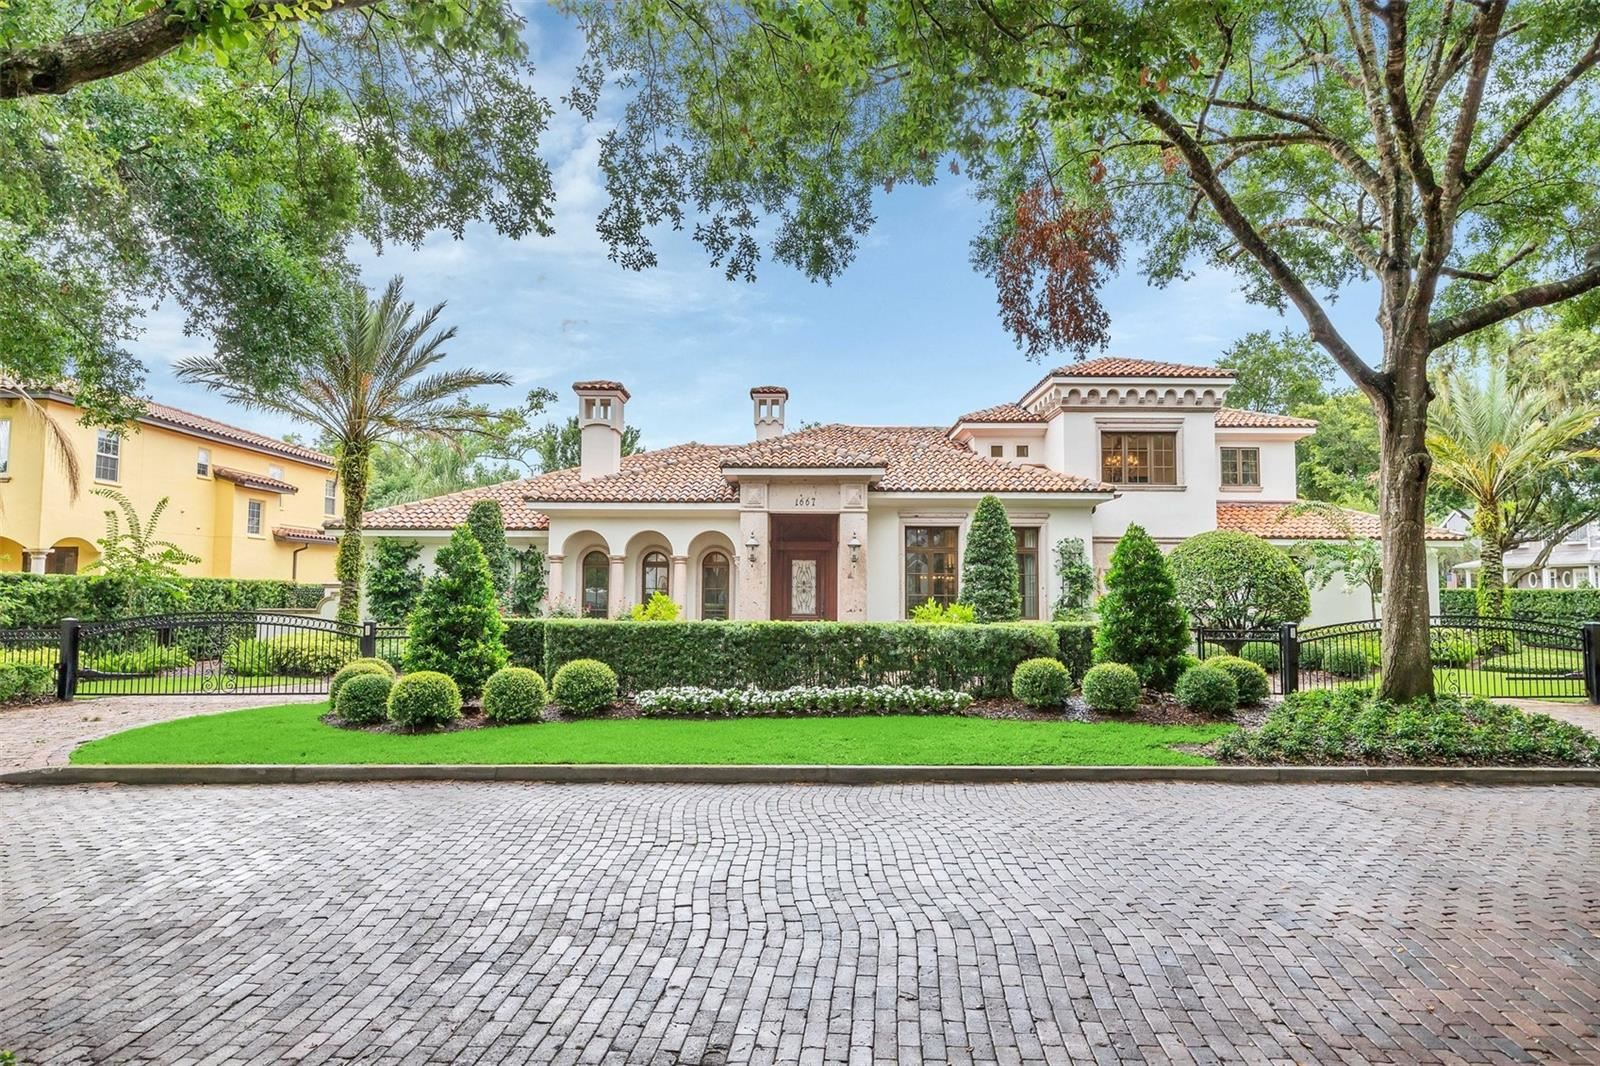 1667 LASBURY AVENUE, Winter Park, FL 32789 - #: O5951693